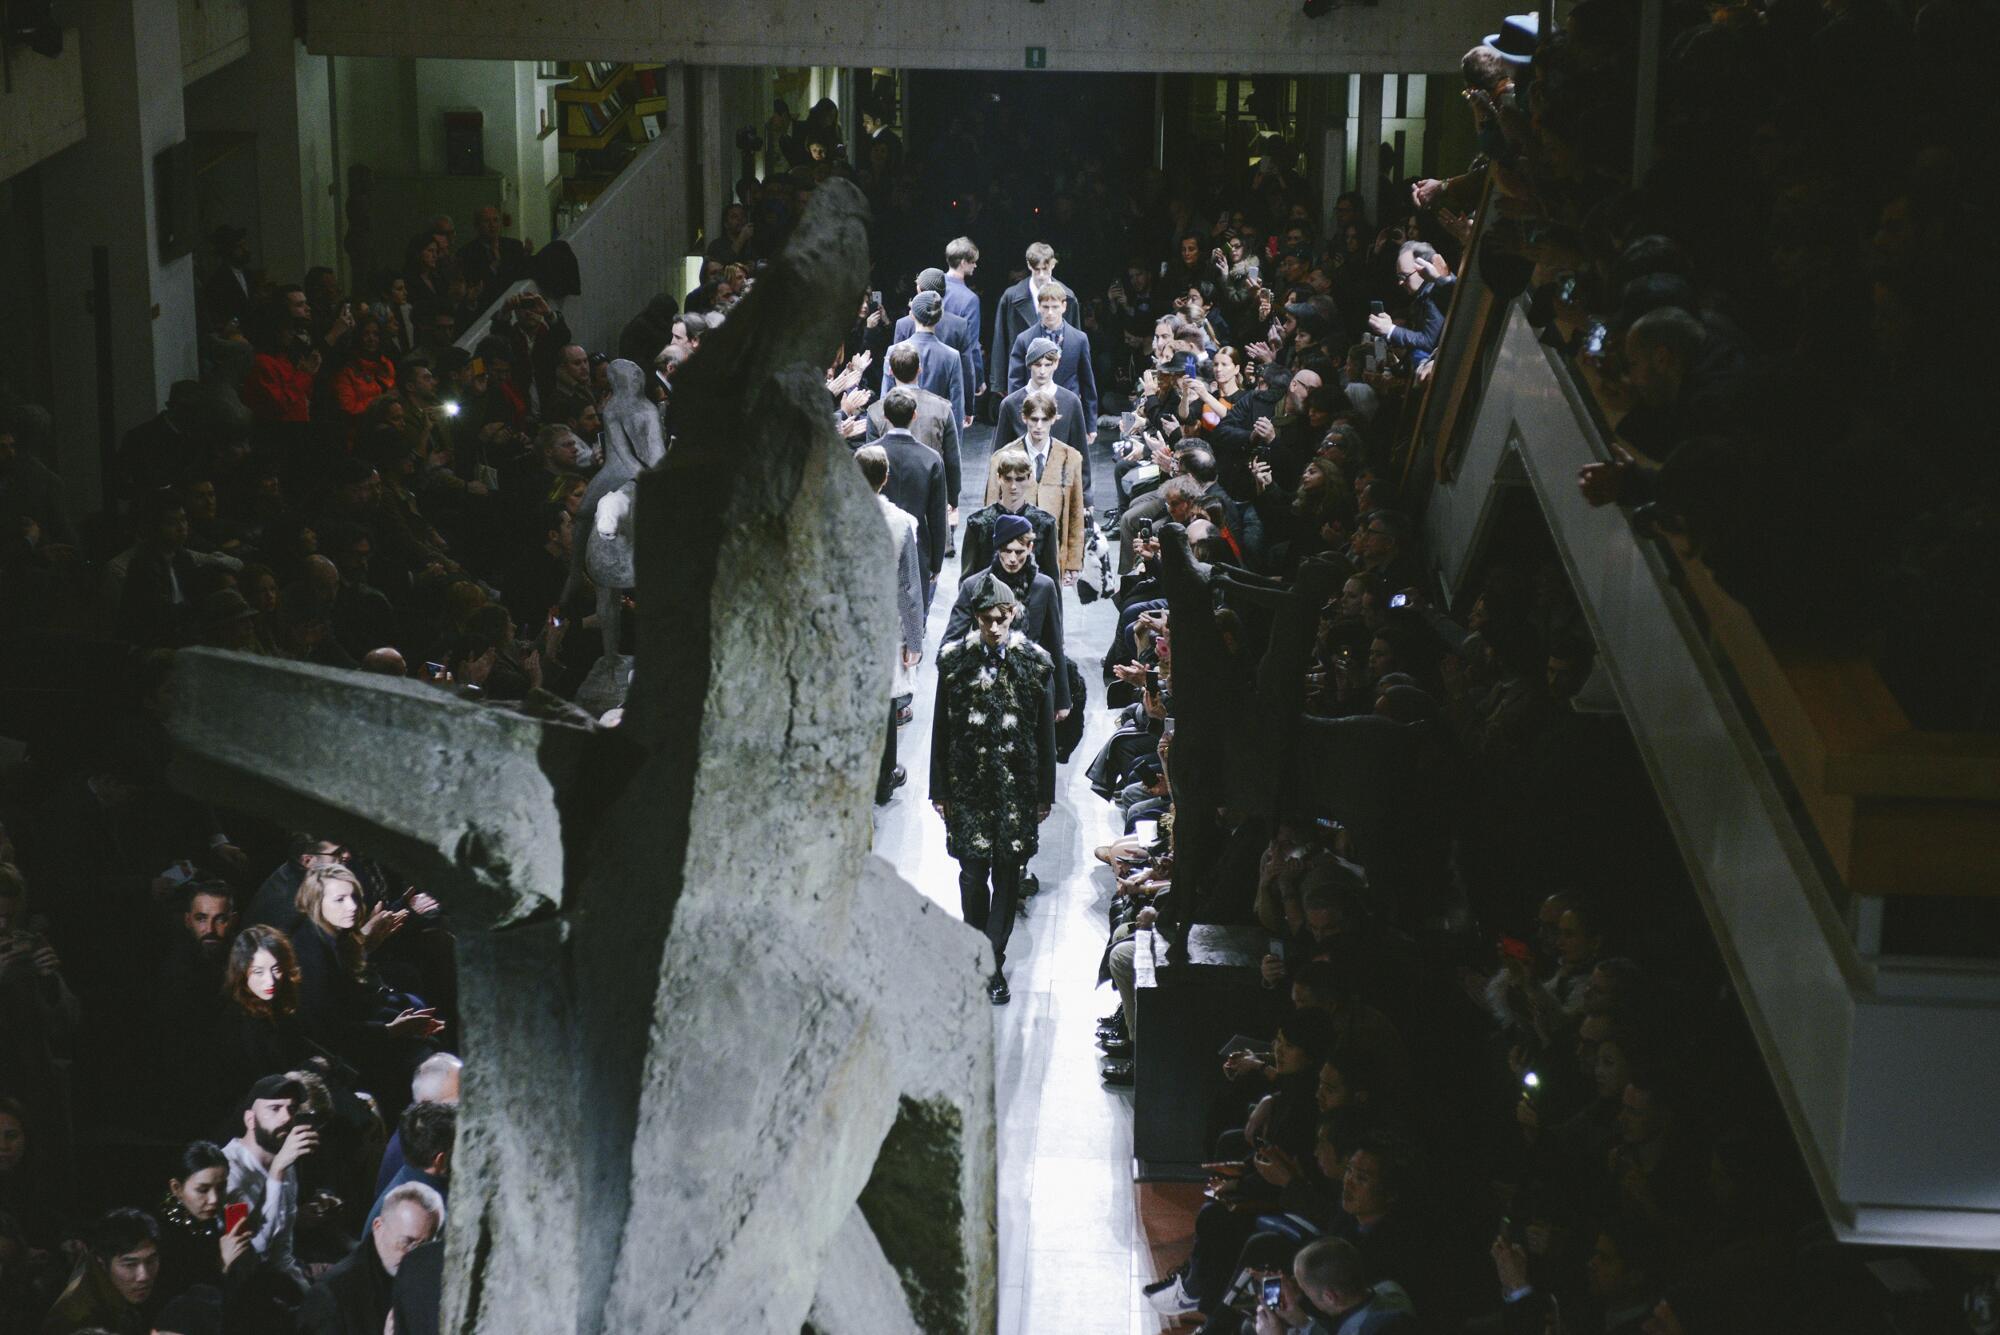 2015 Marni Catwalk Pitti Immagine